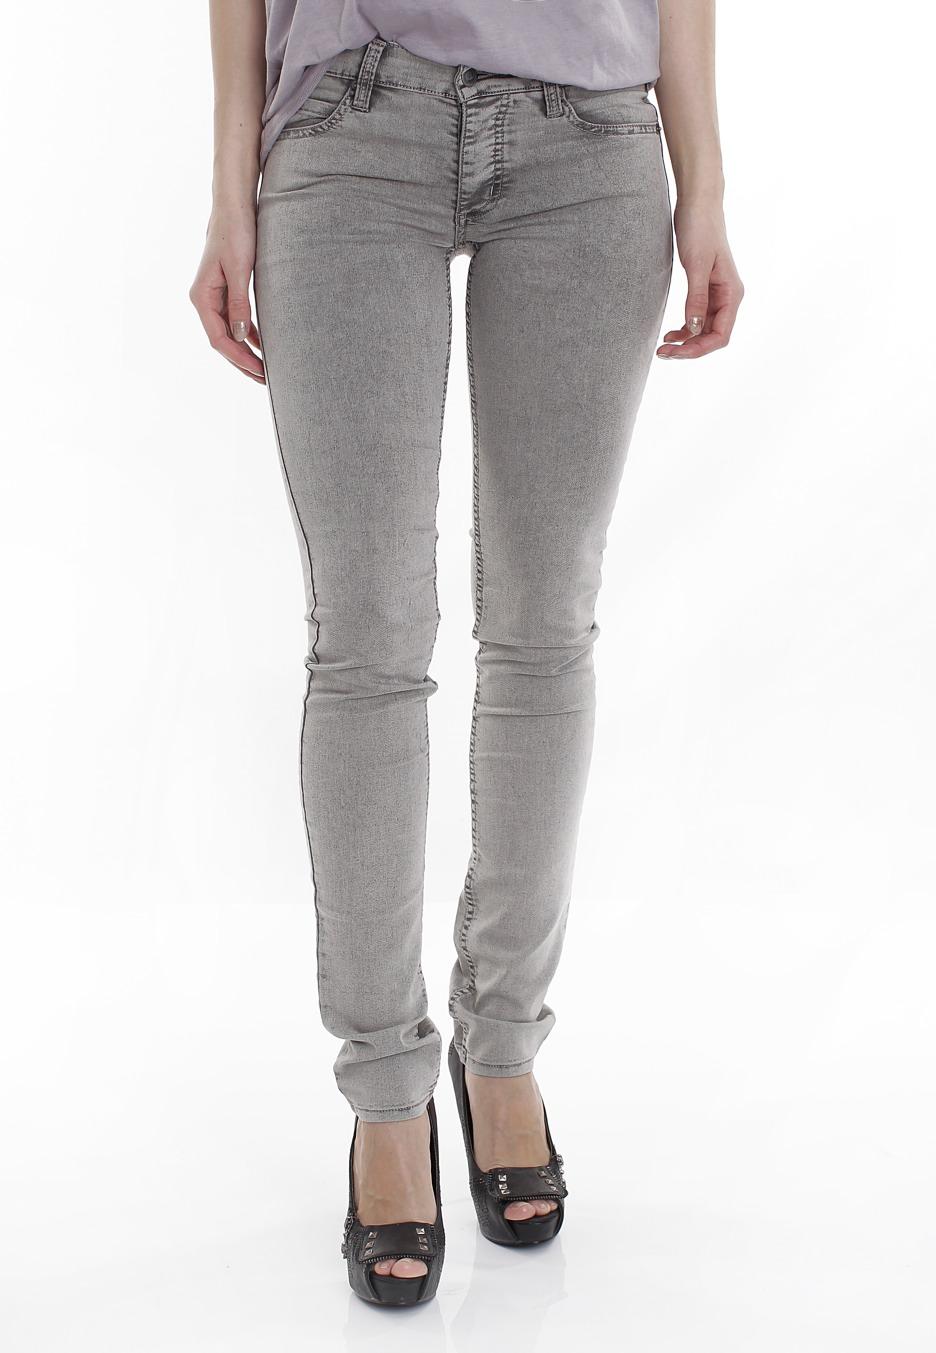 Cheap Monday - Narrow Grey Trash - Jeans - Impericon.com UK